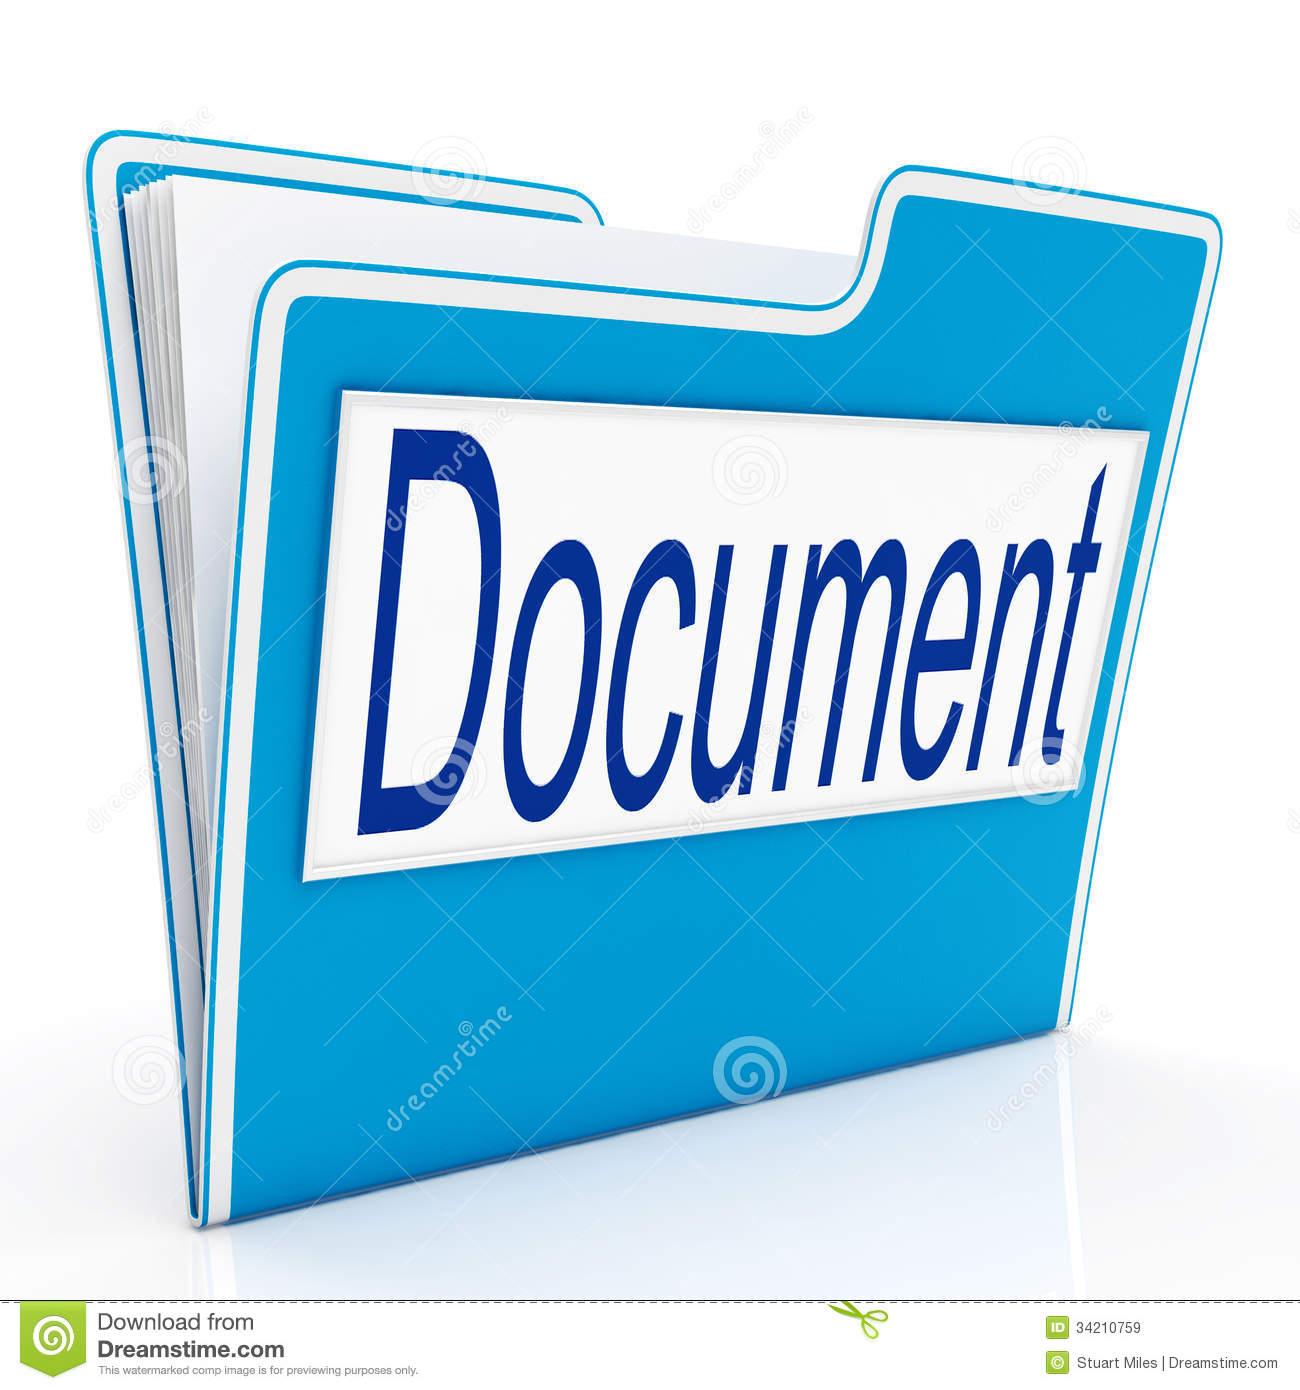 Documentation clipart 1 » Clipart Station.